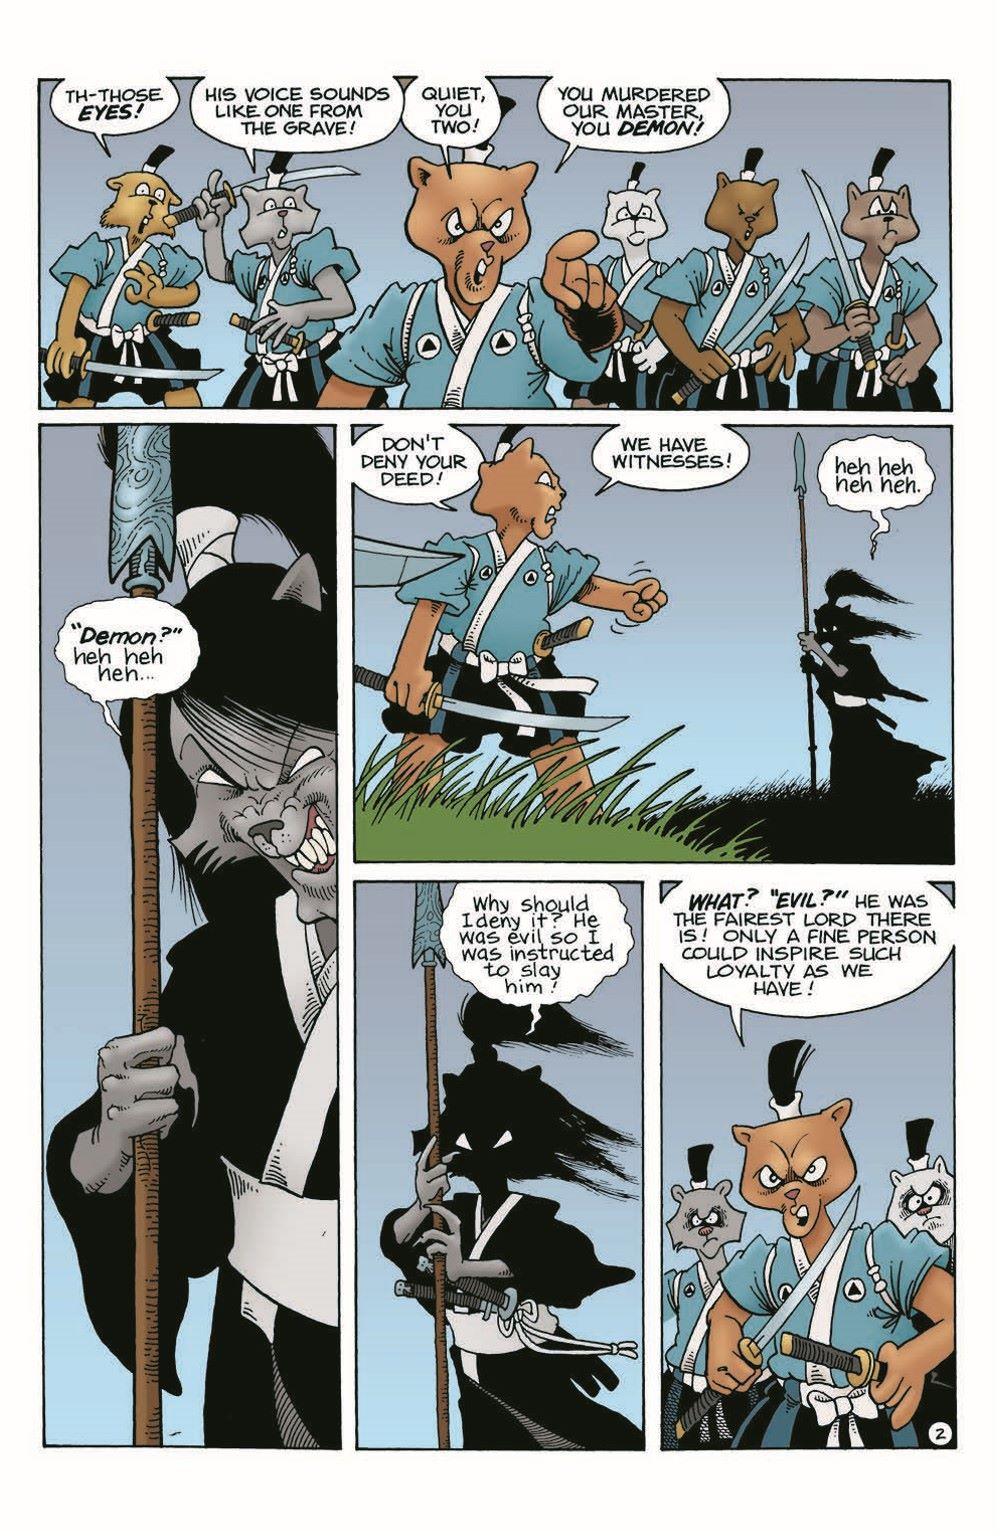 Usagi-WR04_pr-4 ComicList Previews: USAGI YOJIMBO WANDERER'S ROAD #4 (OF 6)